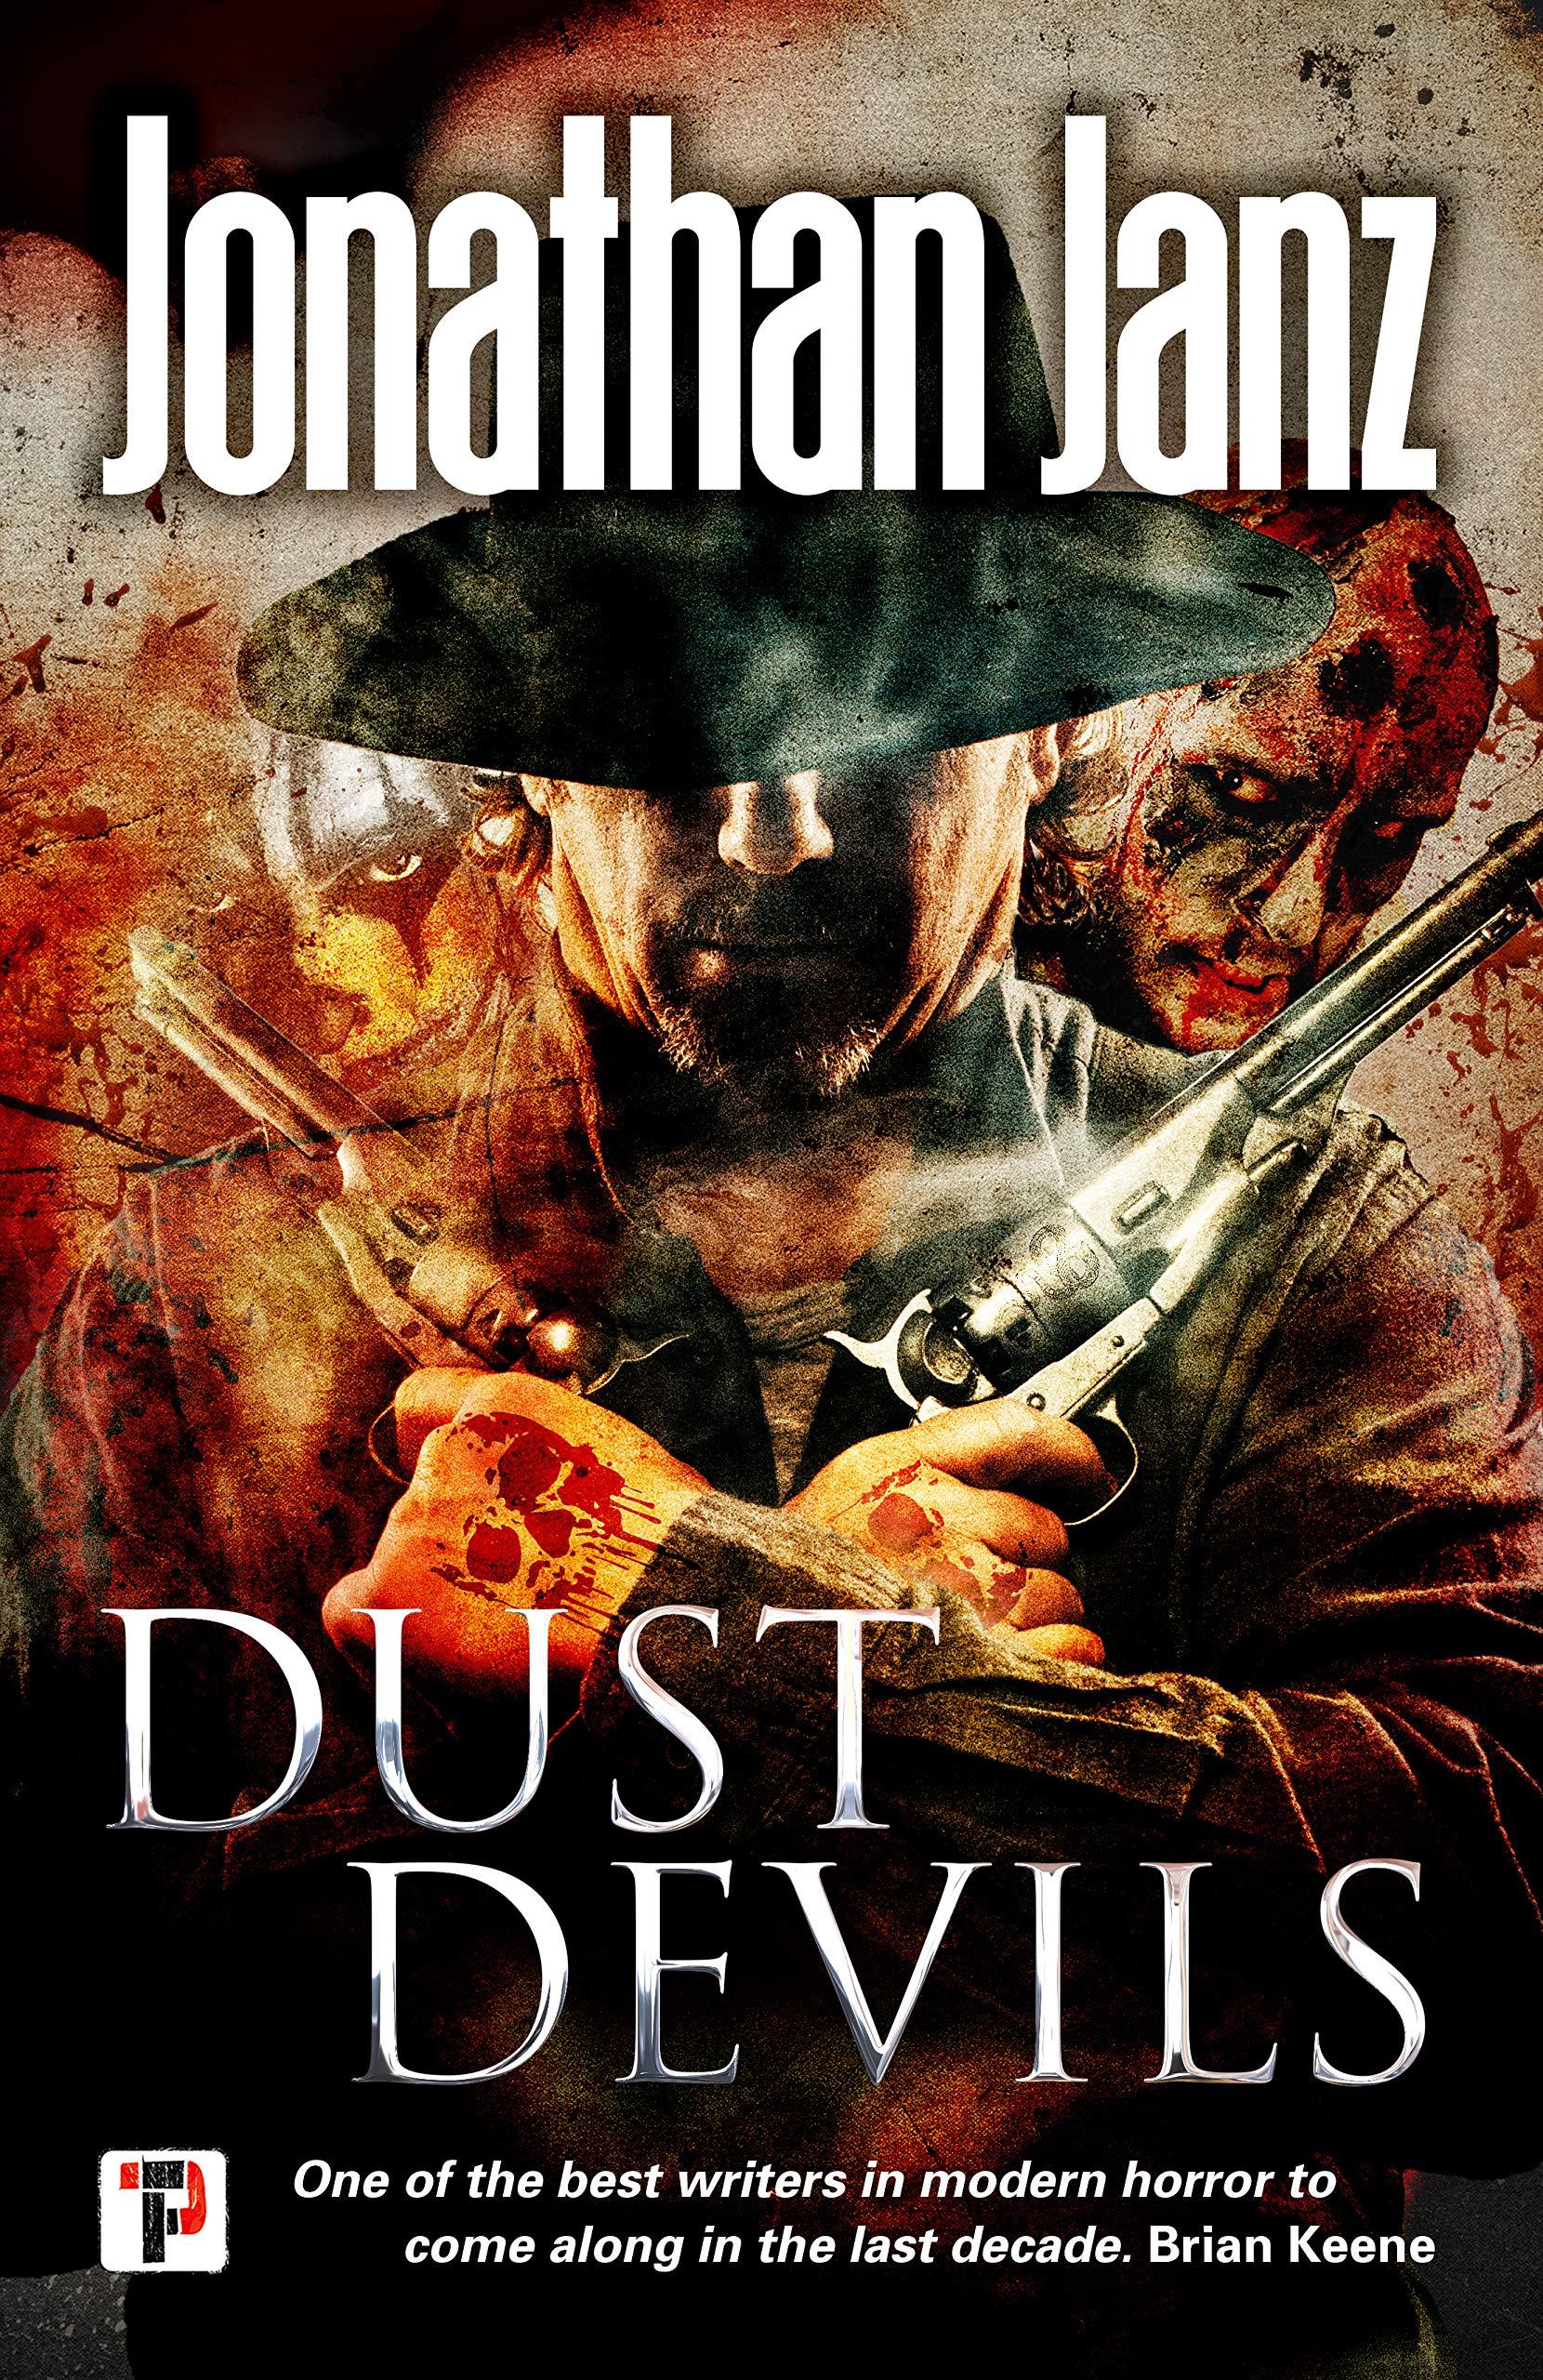 Dust Devils_Jonathan Janz.jpg